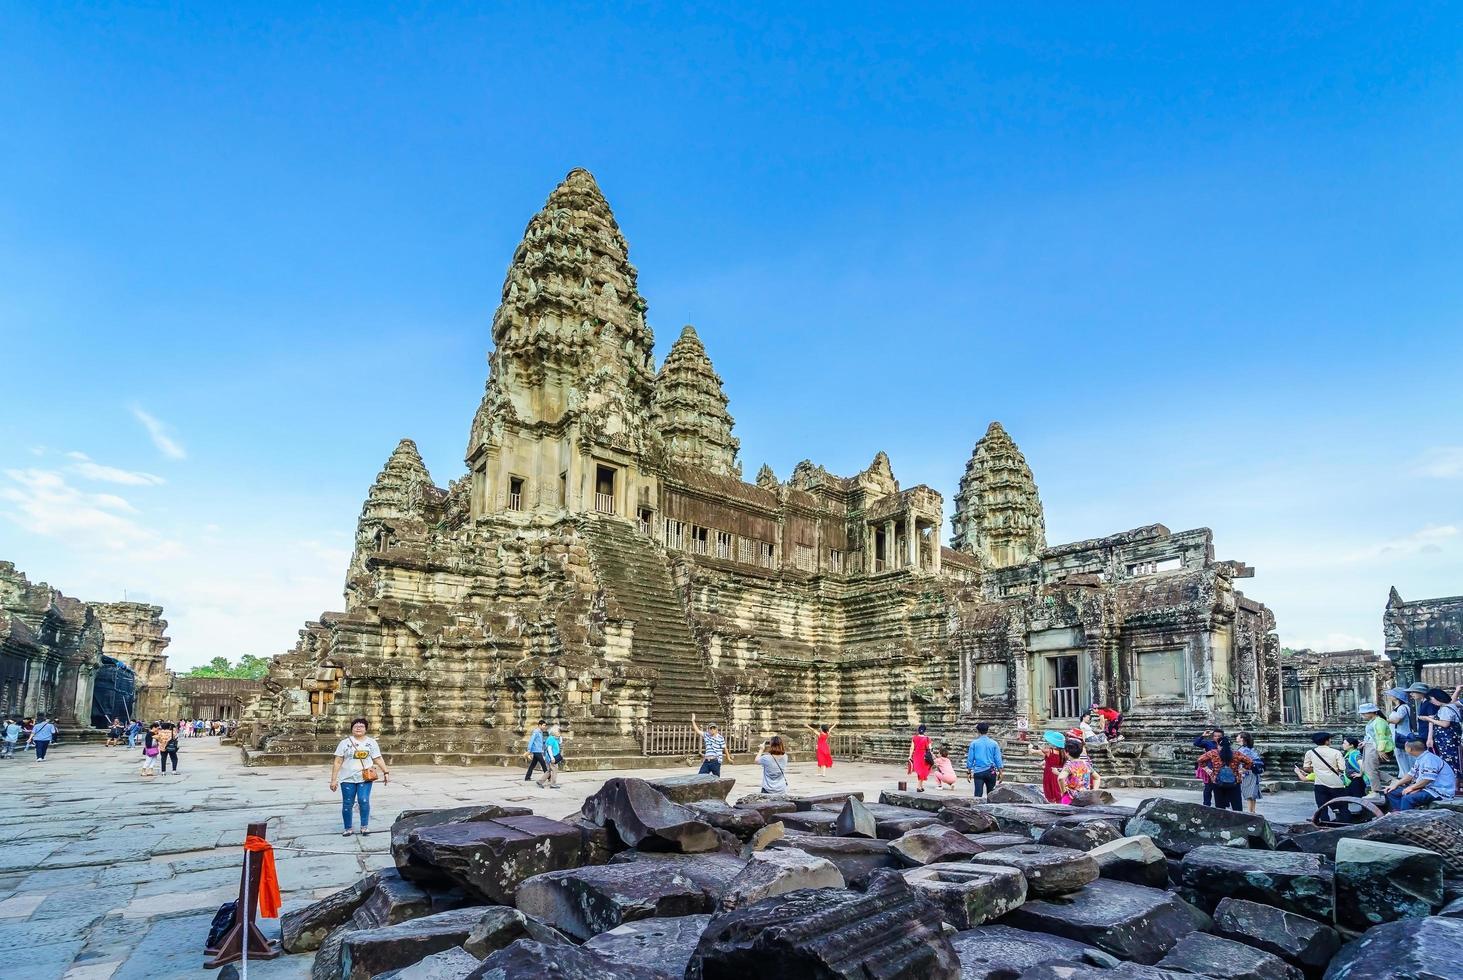 persone al tempio di angkor wat, siem reap, cambogia foto